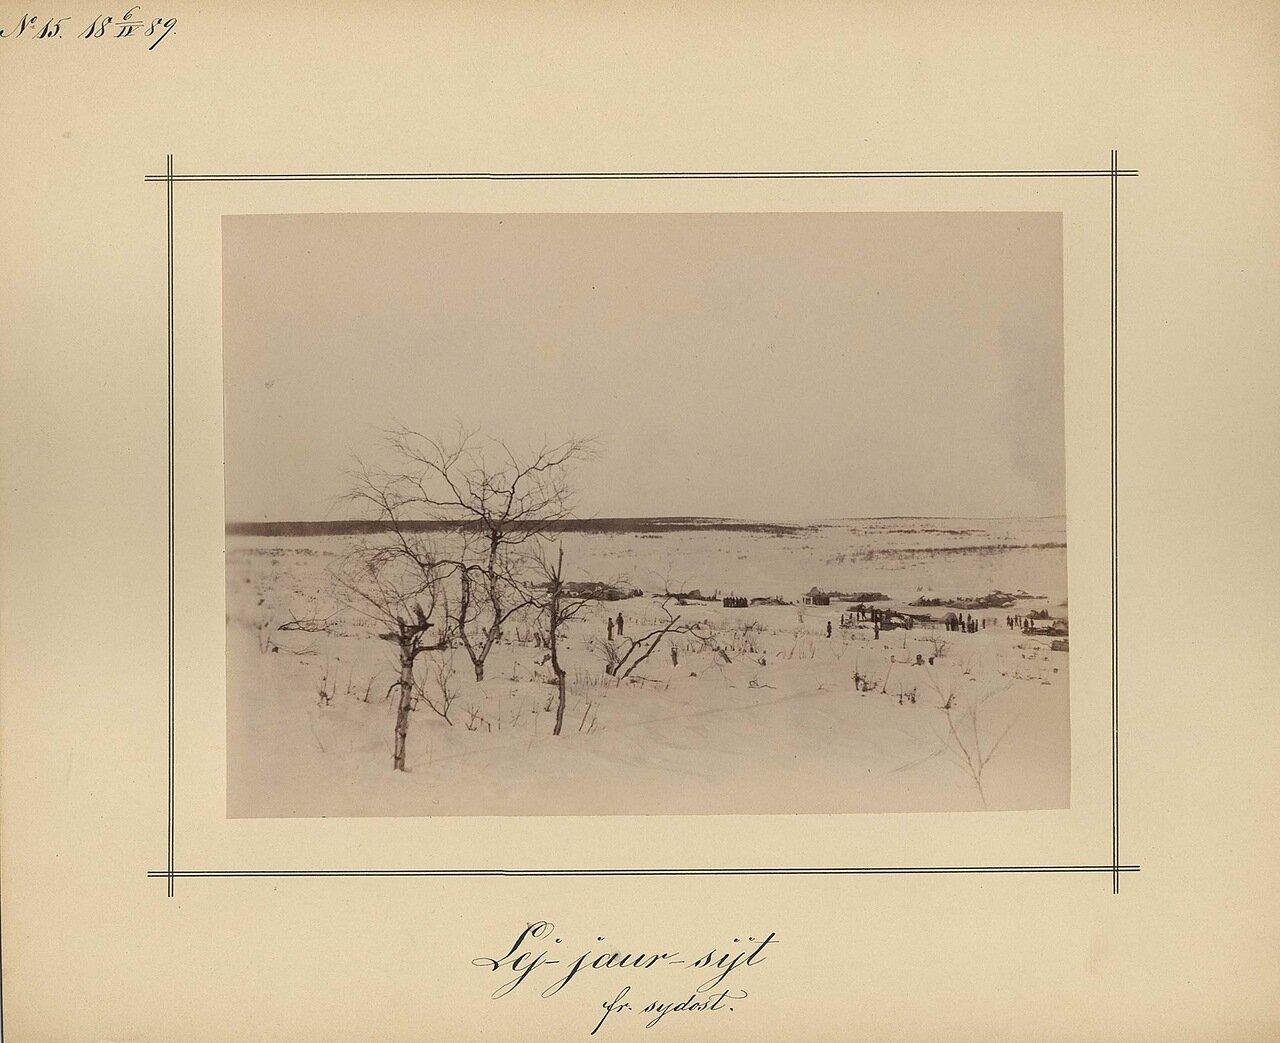 6.4.1889 Зимний пейзаж возле Ловозеро